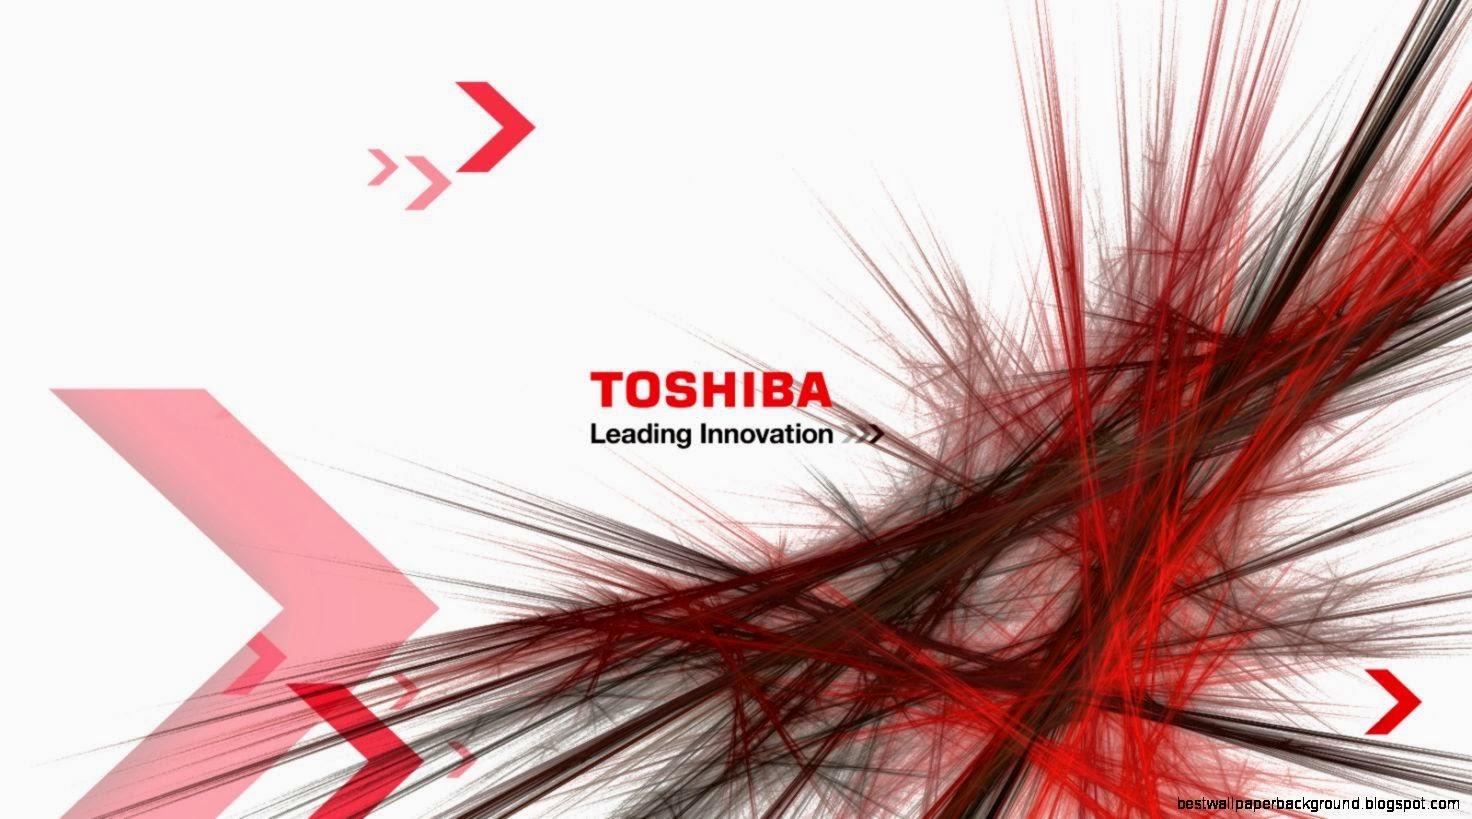 Toshiba Background Wallpaper Best Wallpaper Background 1472x819